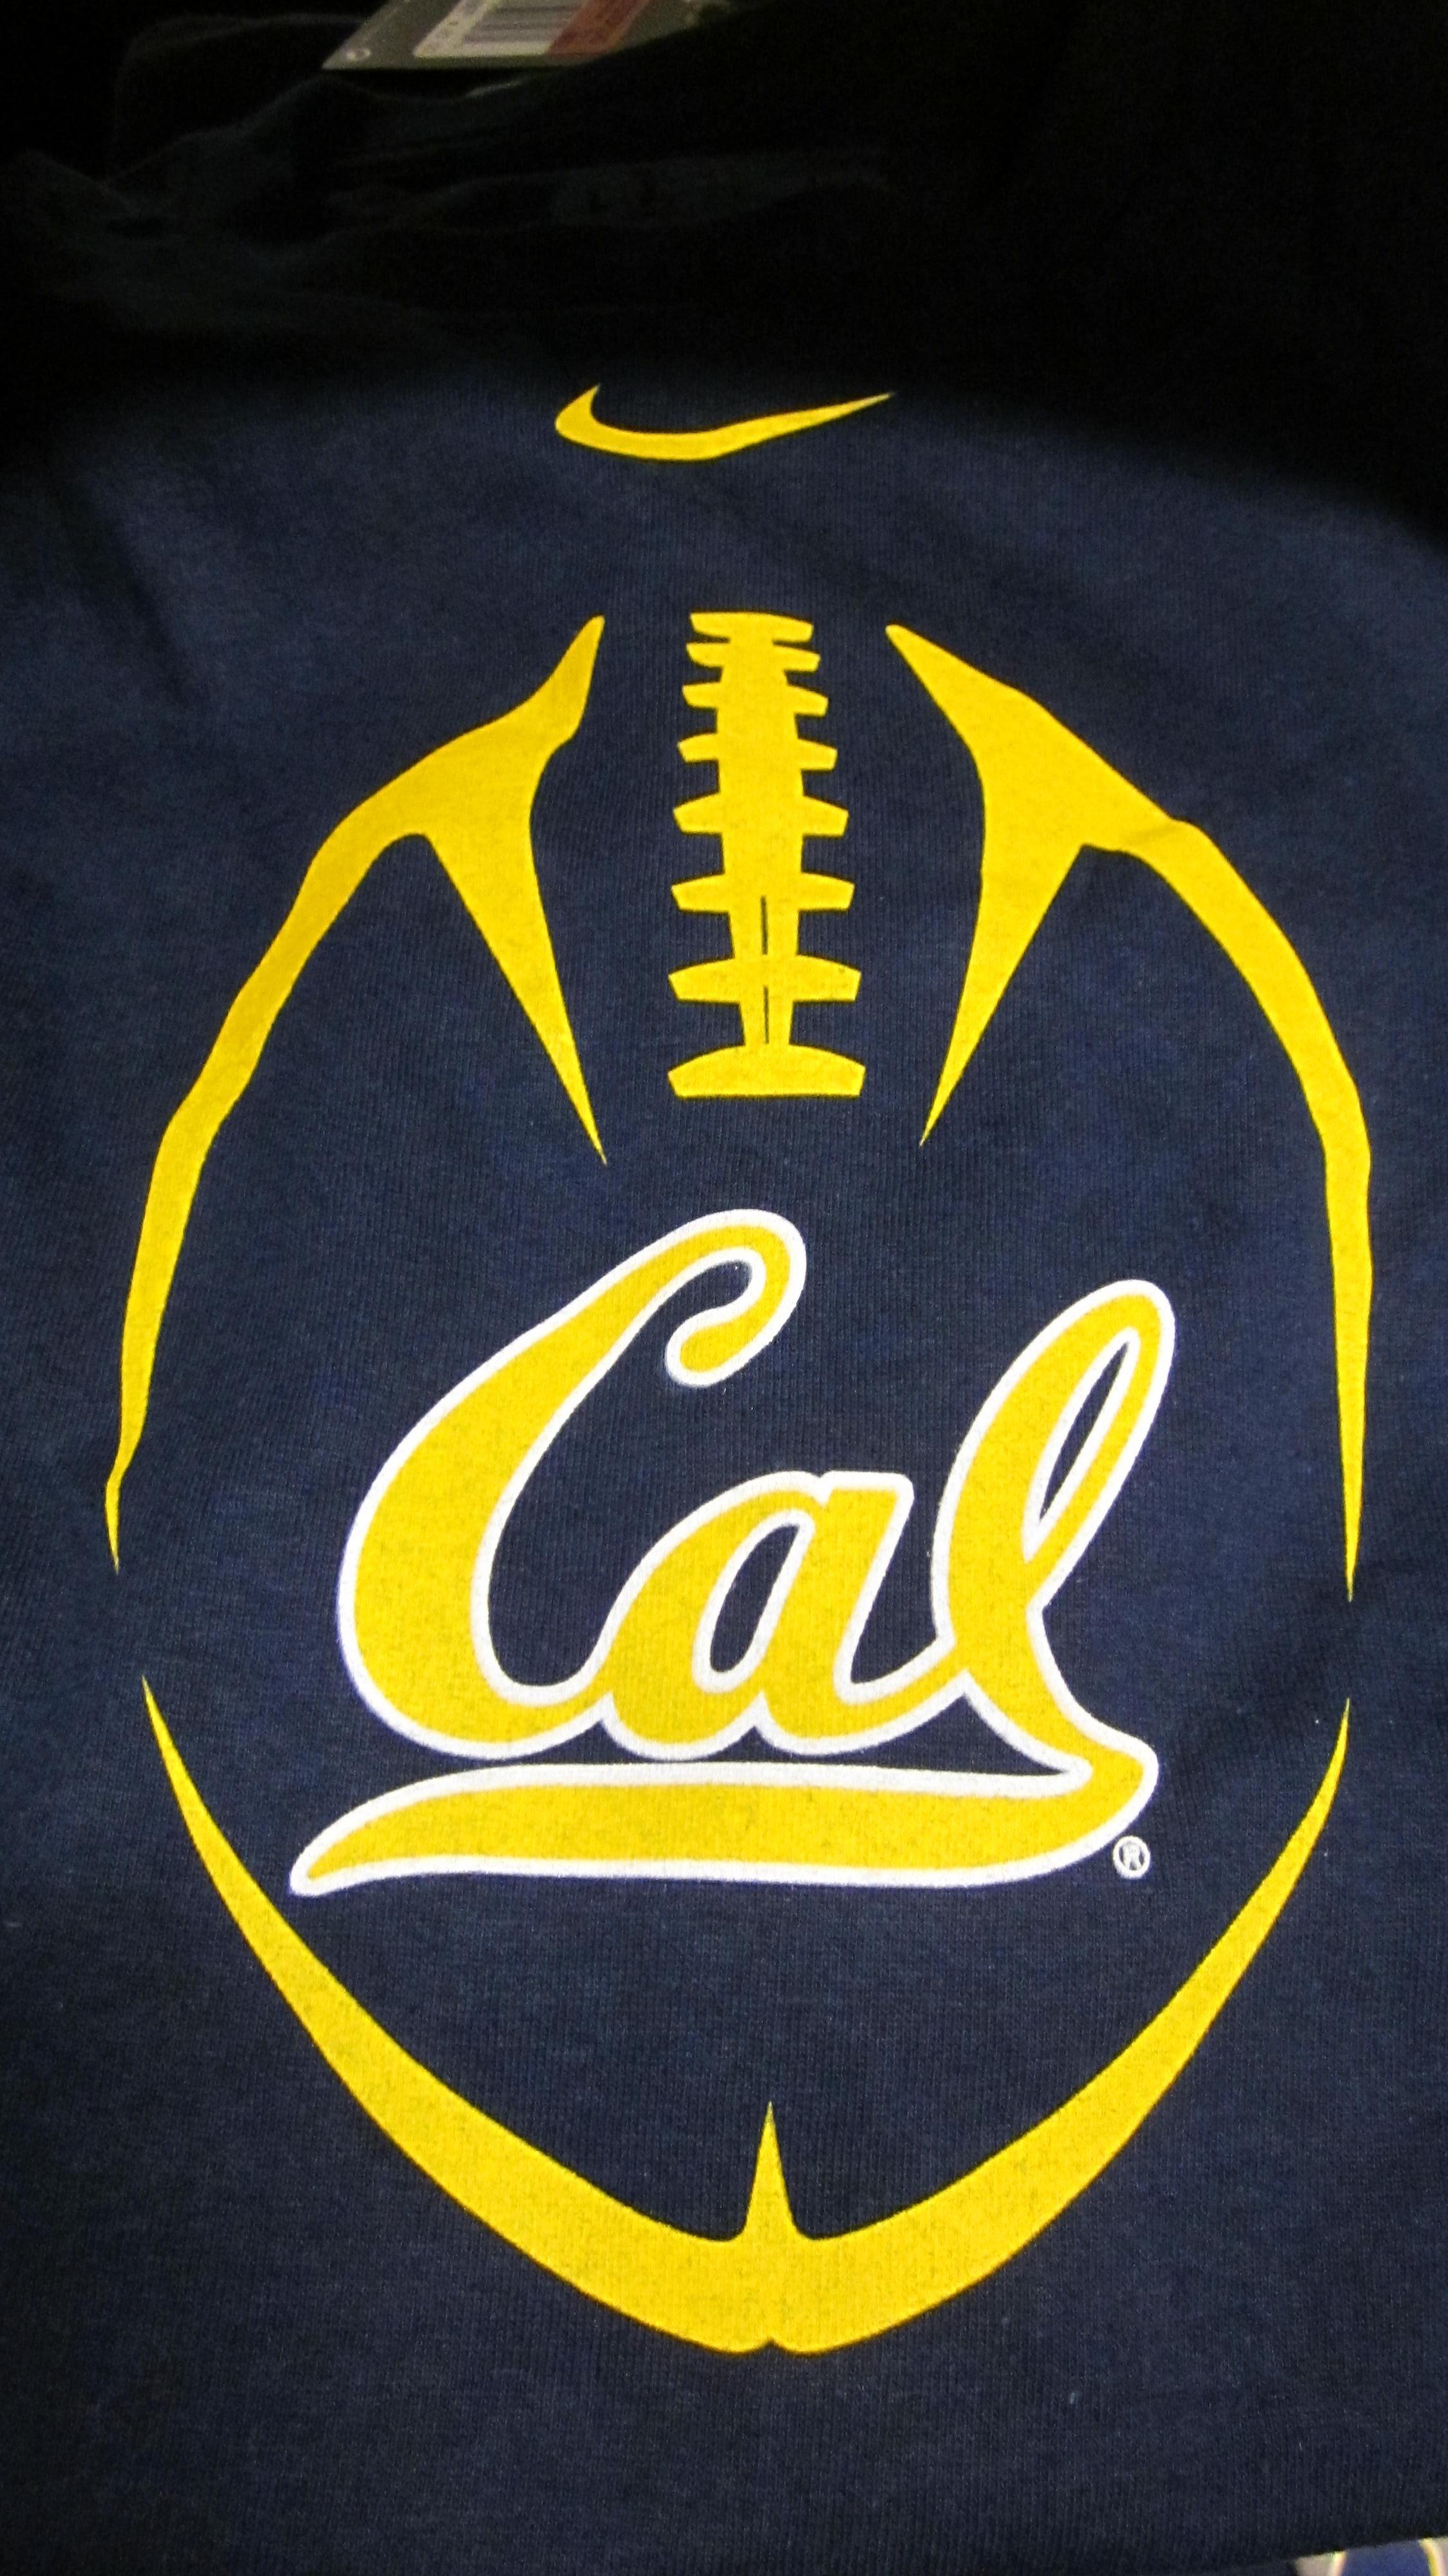 Panthers Shirt Designs